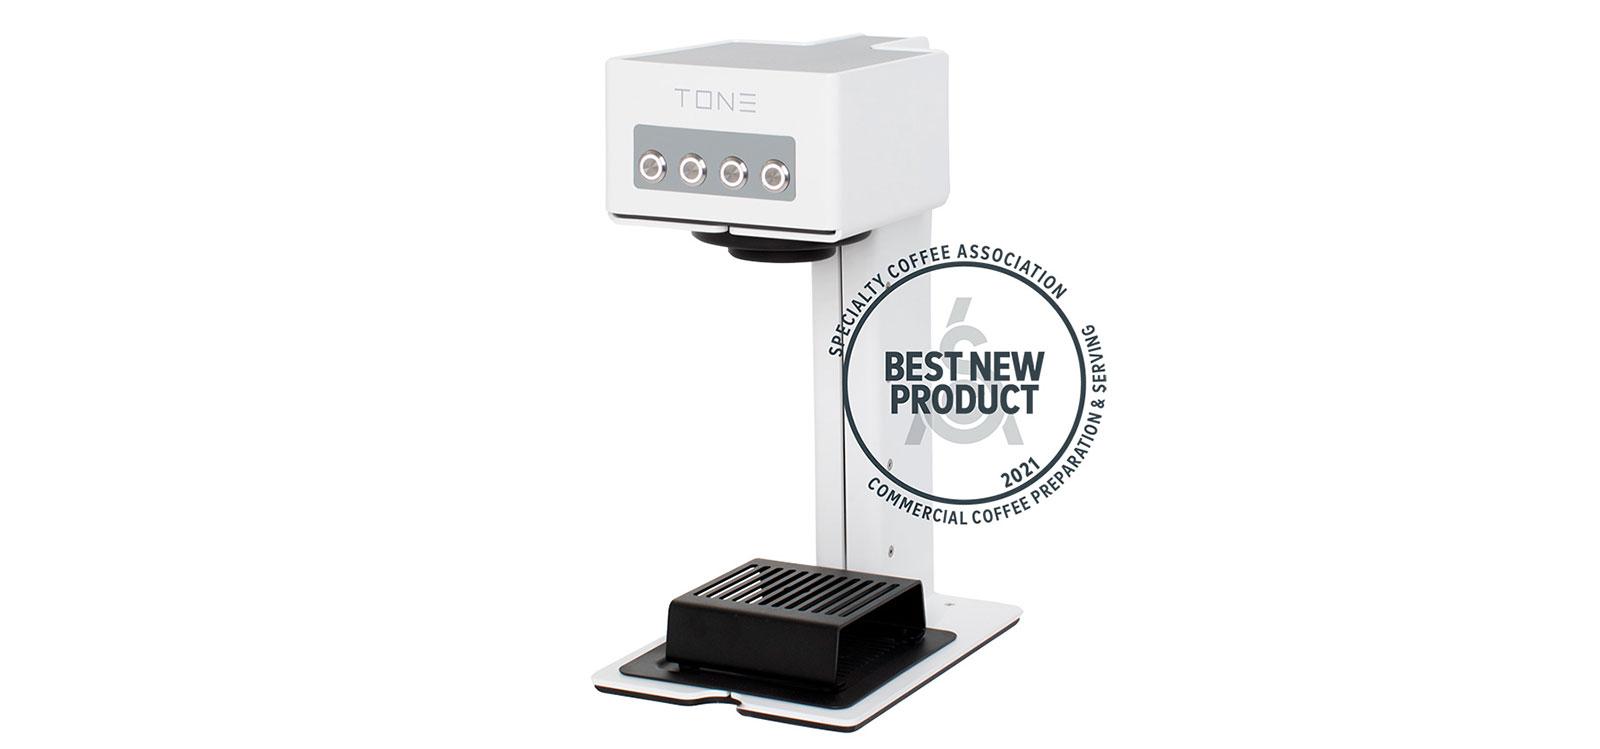 TONE Touch 03 - Award Winner